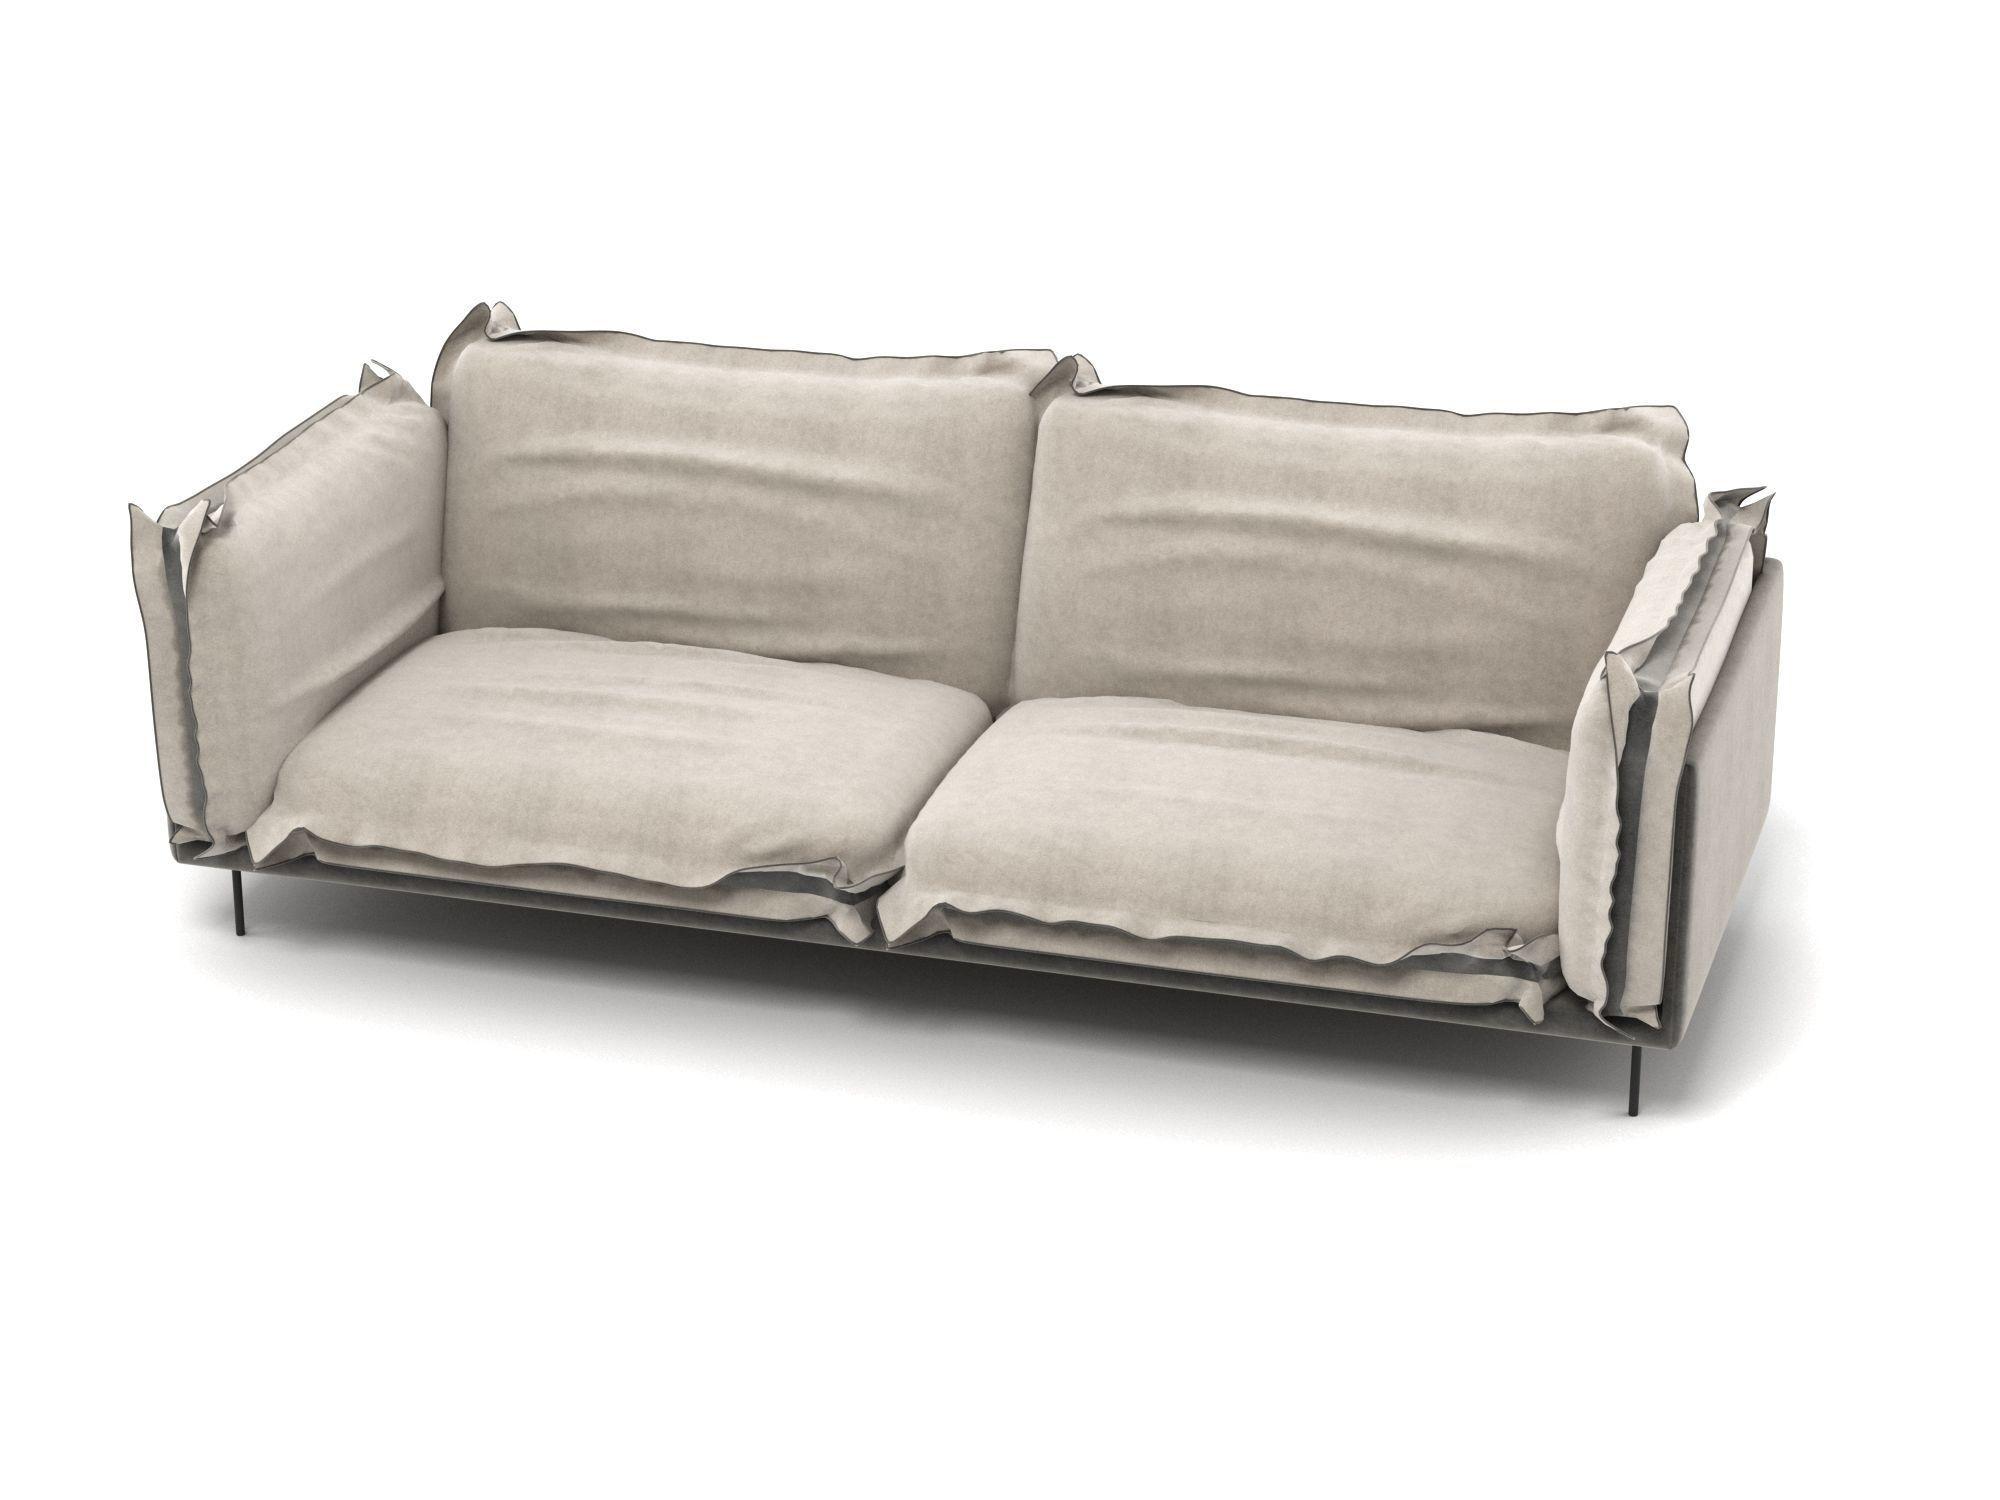 Stupendous Arketipo Auto Reverse Sofa 3D Model Cjindustries Chair Design For Home Cjindustriesco